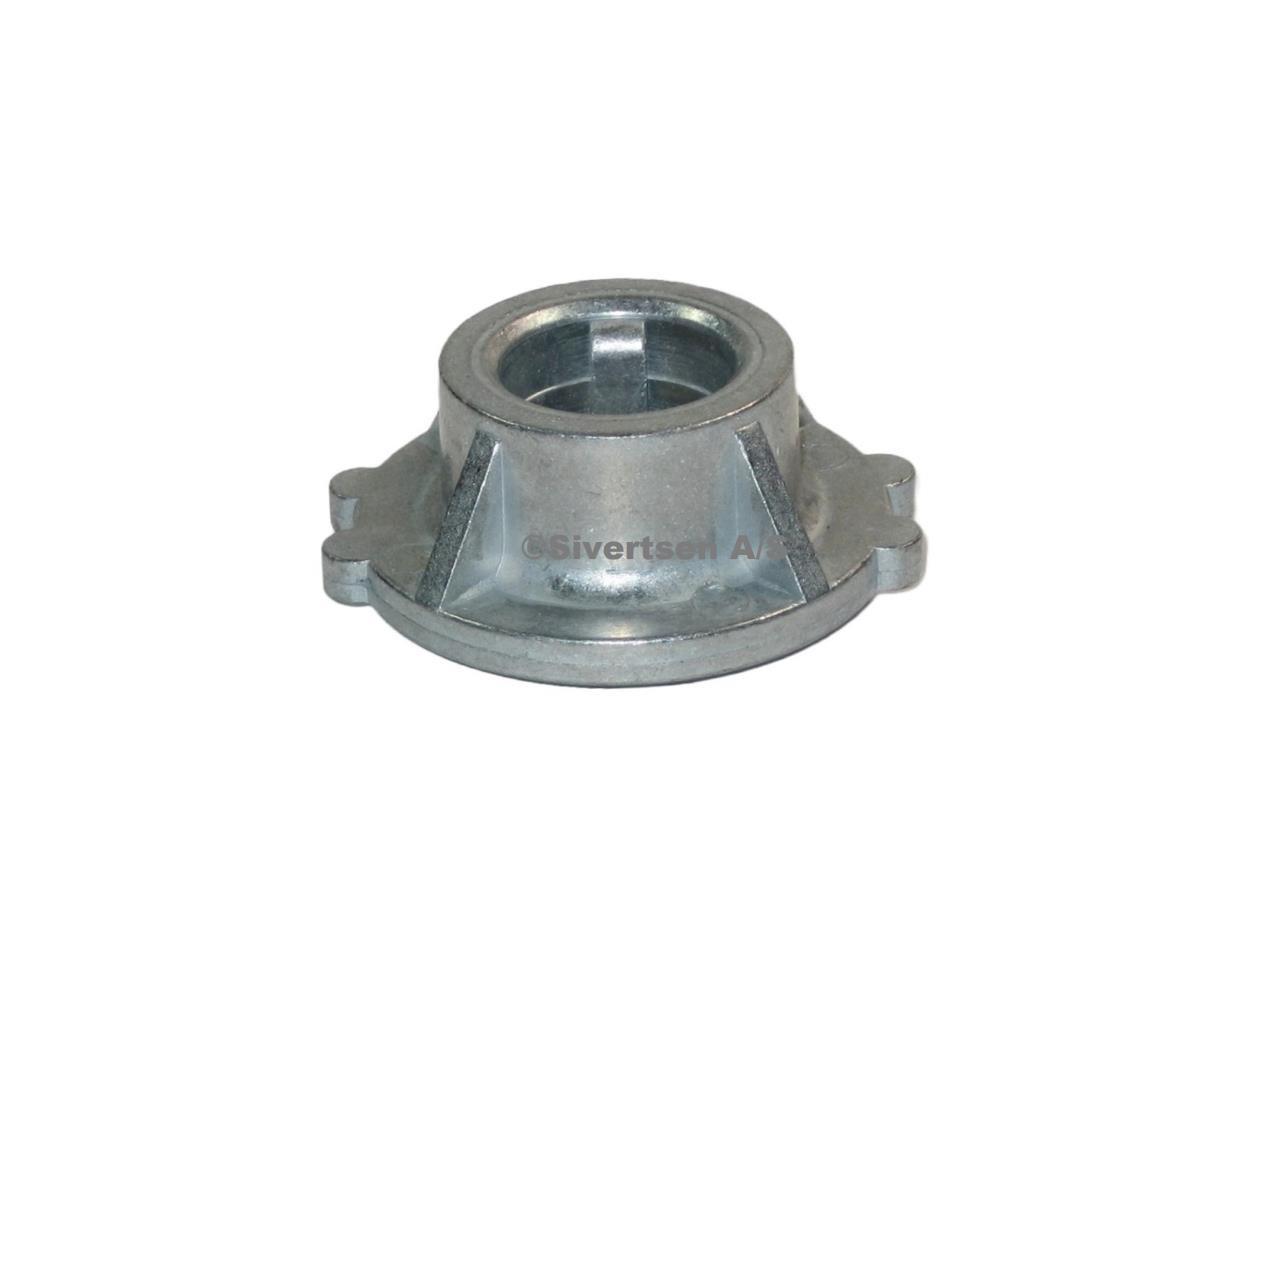 Klippo knivholder - Ø 25 mm aksel